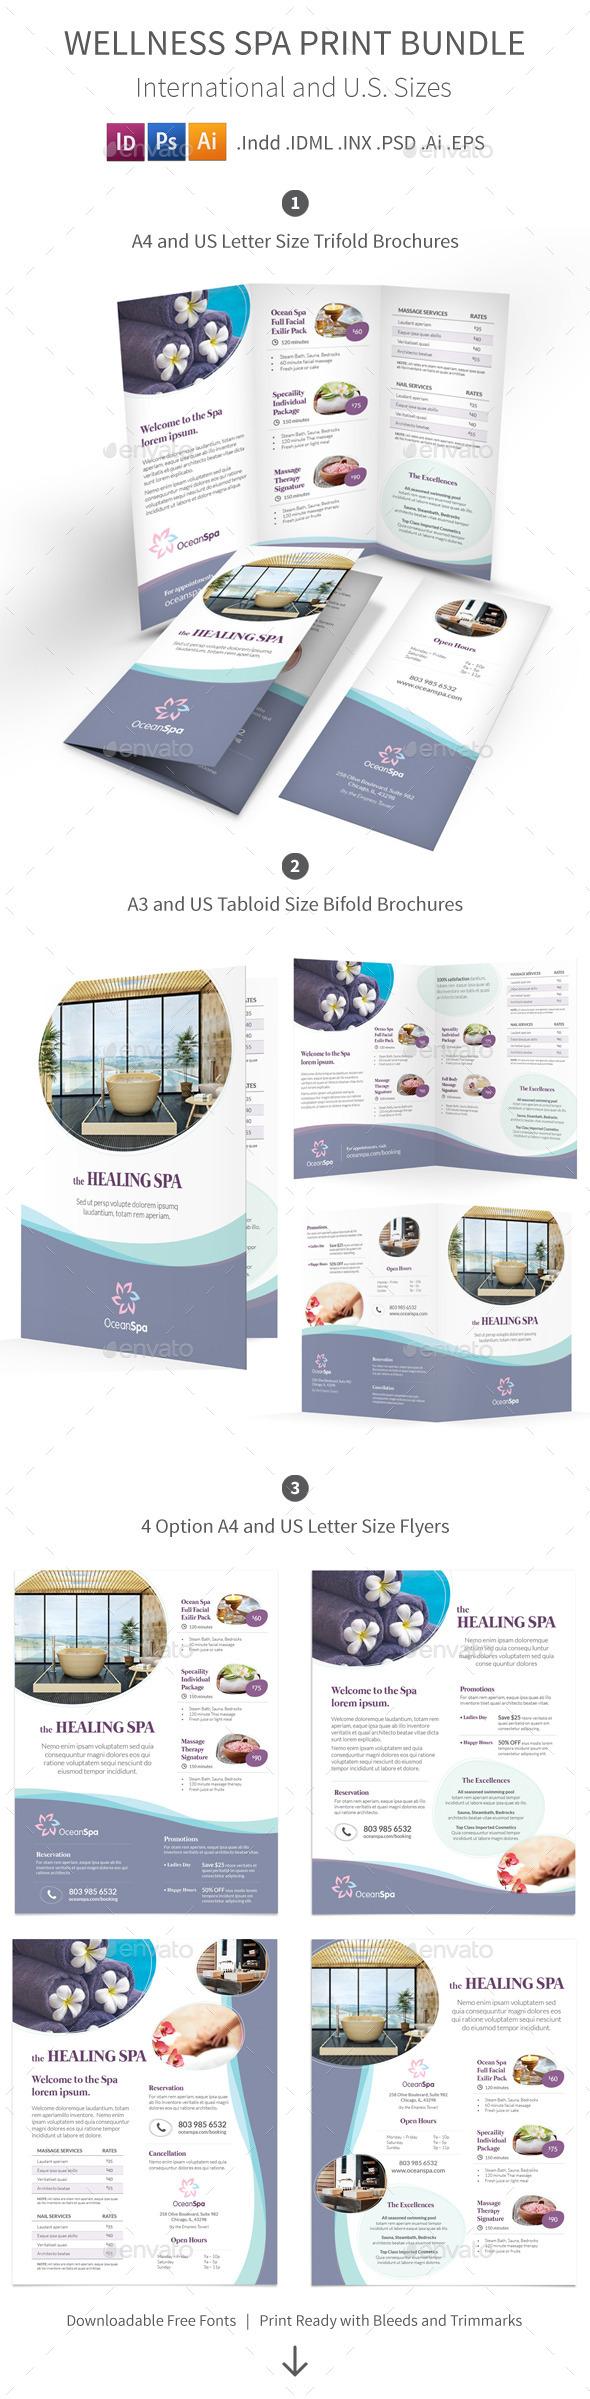 Wellness Spa Print Bundle - Informational Brochures